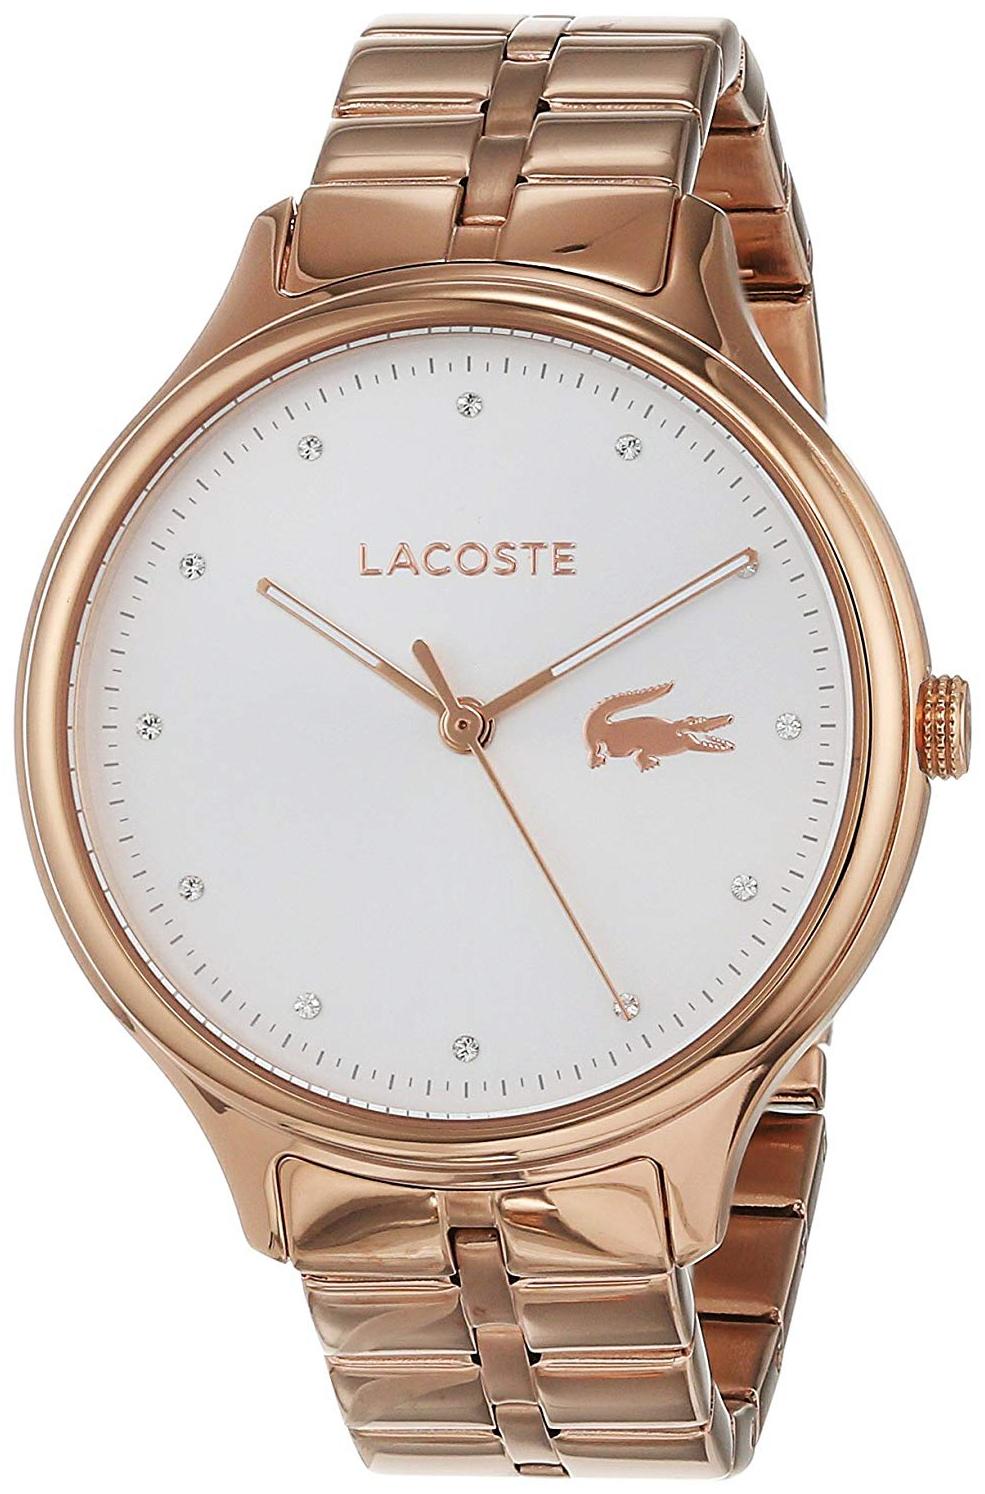 Lacoste 99999 Dameklokke 2001032 Hvit/Rose-gulltonet stål Ø38 mm - Lacoste